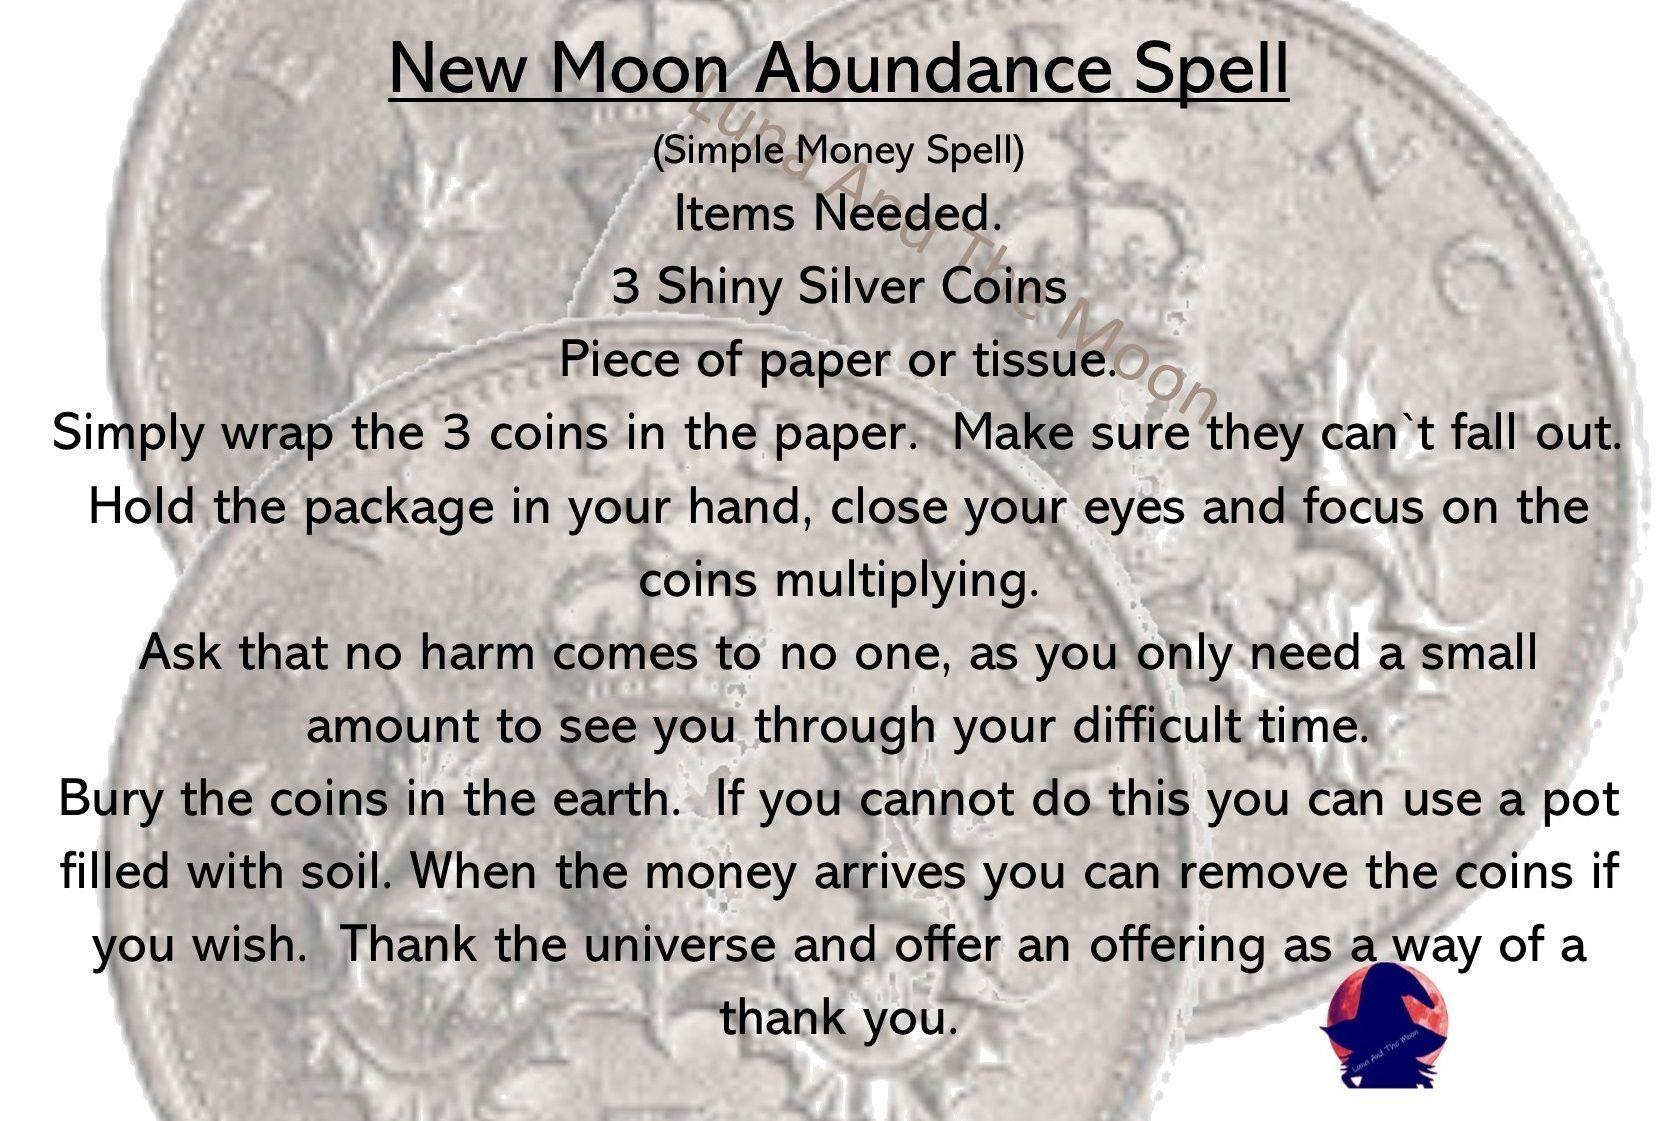 New Moon Abundance Spell. Simple Money Spell. #moneyspell New Moon Abundance Spell. Simple Money Spell. #moneyspells New Moon Abundance Spell. Simple Money Spell. #moneyspell New Moon Abundance Spell. Simple Money Spell. #moneyspells